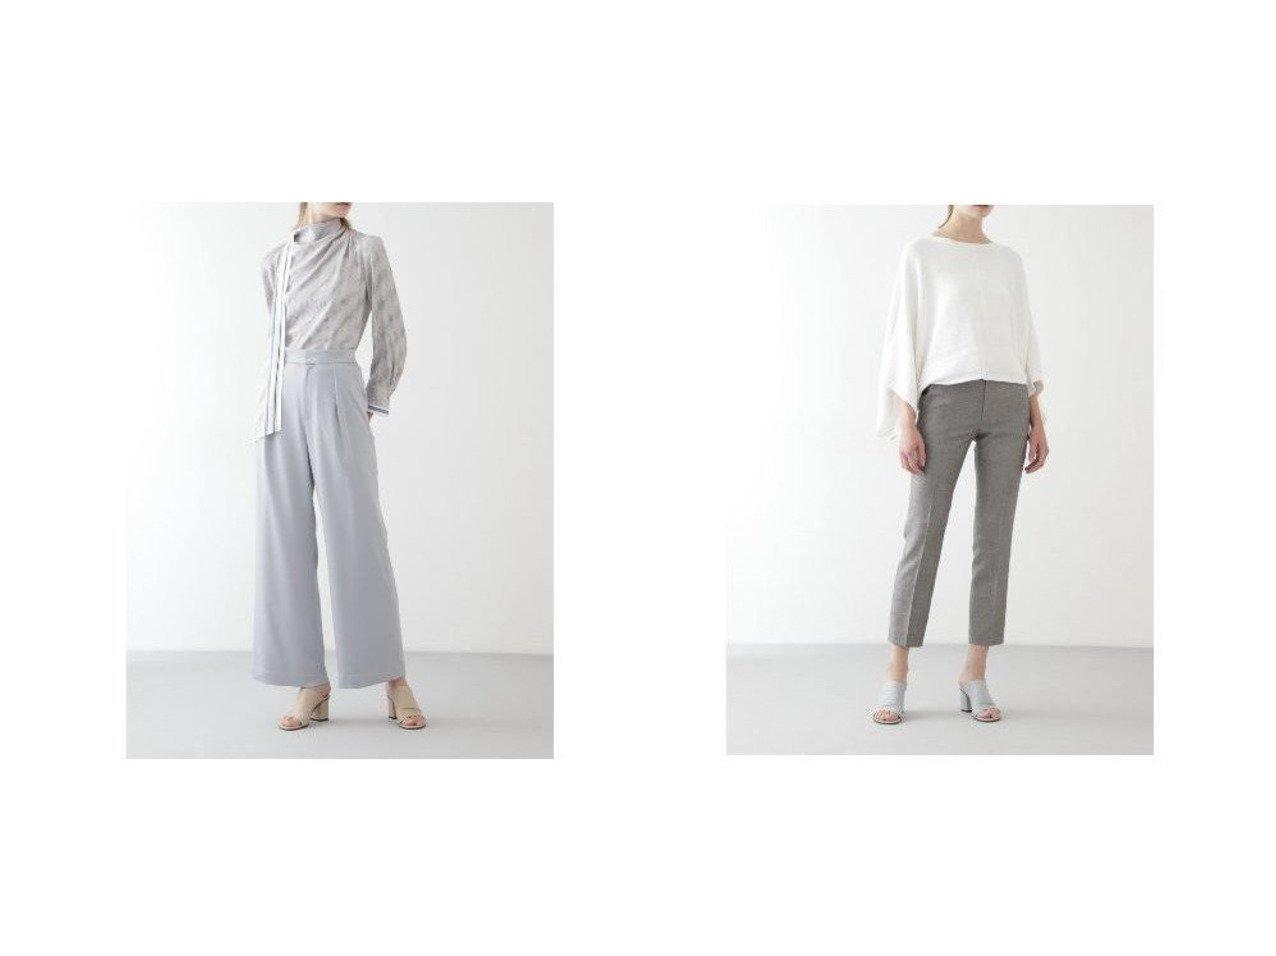 【BOSCH/ボッシュ】のハンマーサテンタックパンツ&ウール麻セットアップクロップドパンツ BOSCHのおすすめ!人気、トレンド・レディースファッションの通販  おすすめで人気の流行・トレンド、ファッションの通販商品 メンズファッション・キッズファッション・インテリア・家具・レディースファッション・服の通販 founy(ファニー) https://founy.com/ ファッション Fashion レディースファッション WOMEN パンツ Pants セットアップ Setup パンツ Pants ギャザー サテン スタンダード ドレープ フロント ポケット モダン リラックス ワイド シャンブレー パターン マニッシュ 定番 Standard |ID:crp329100000020175